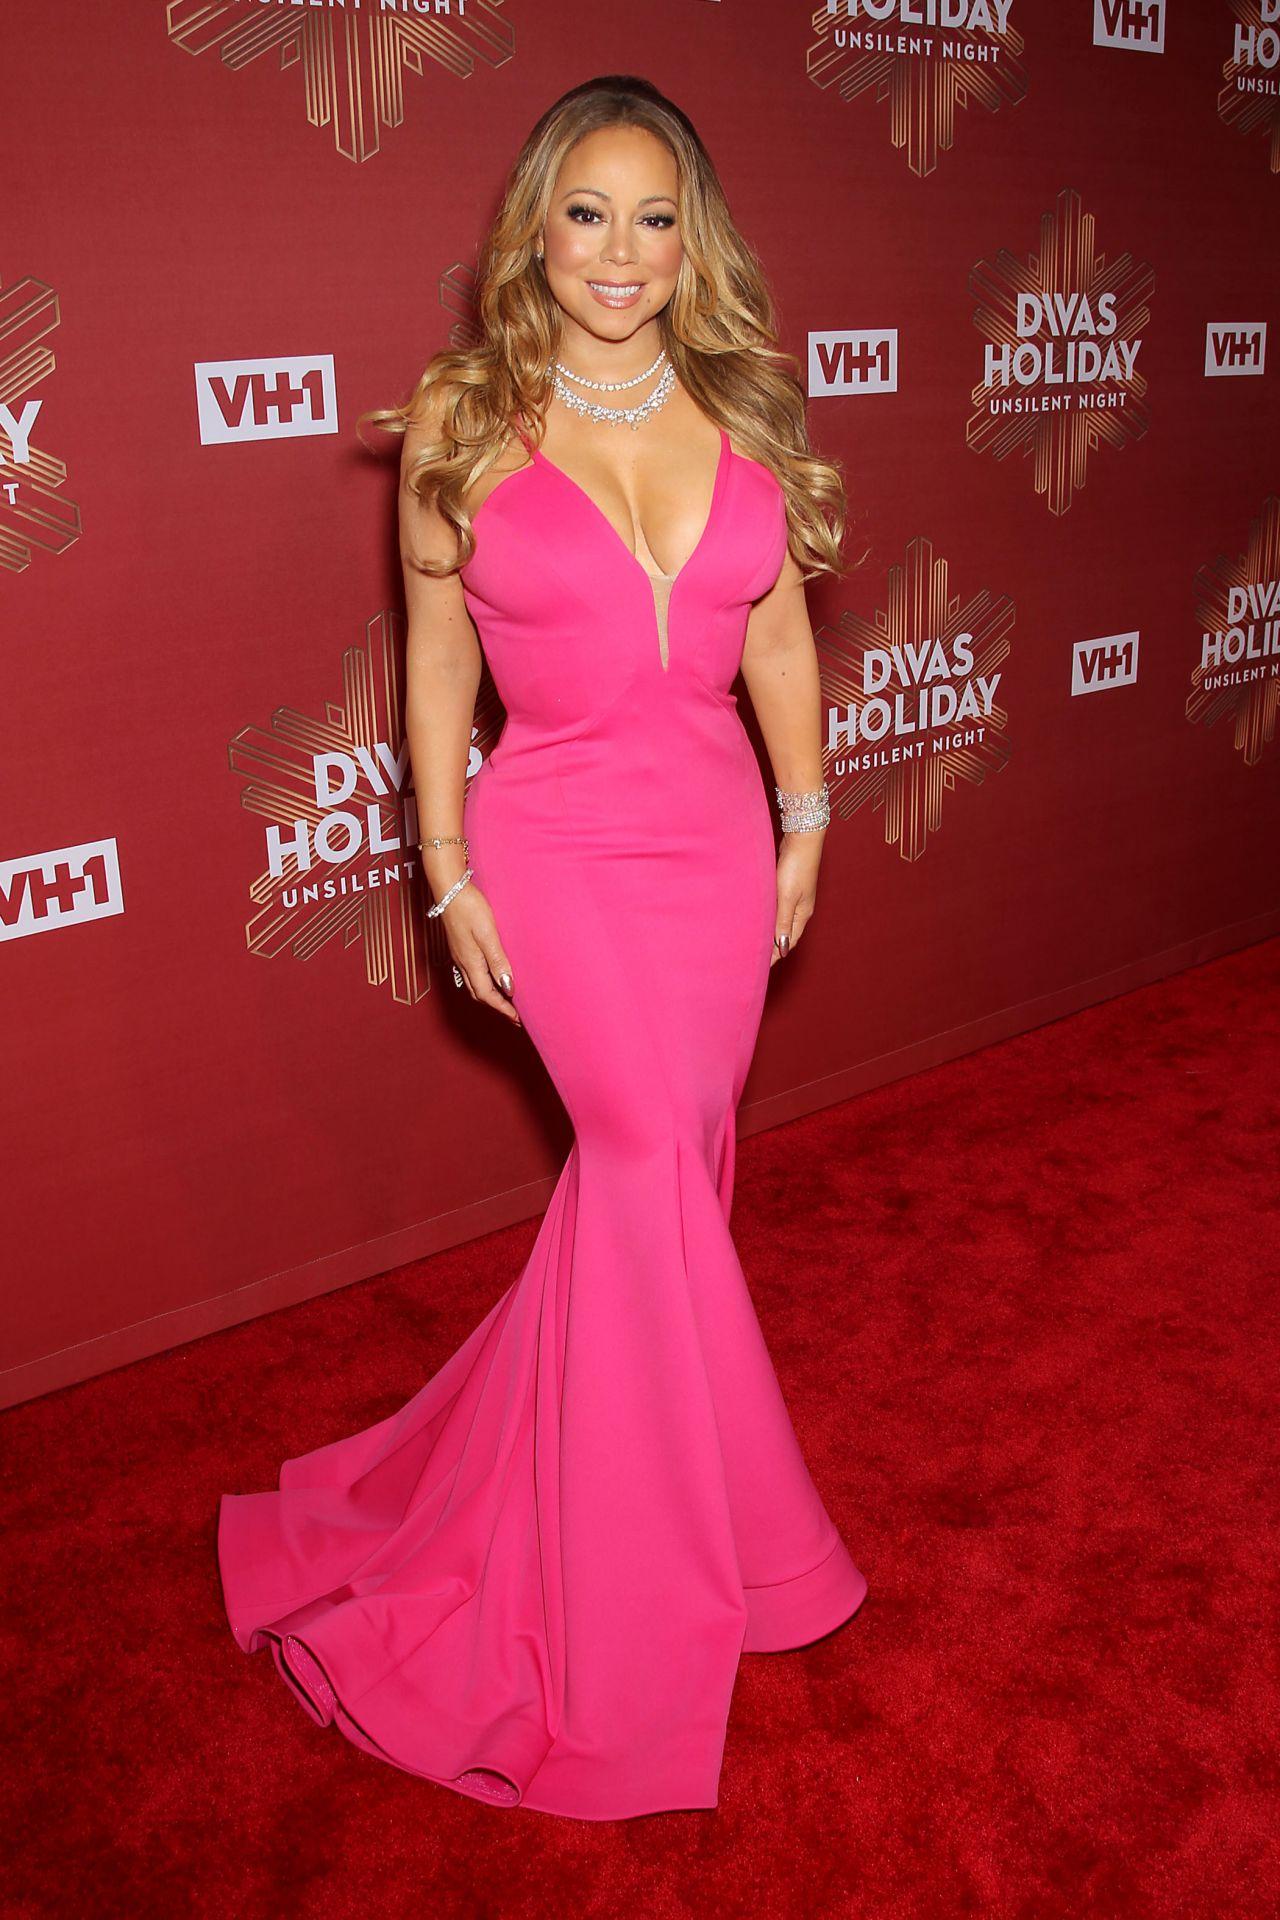 Mariah Carey - 2016 VH1's Divas Holiday: Unsilent Night in ... Mariah Carey